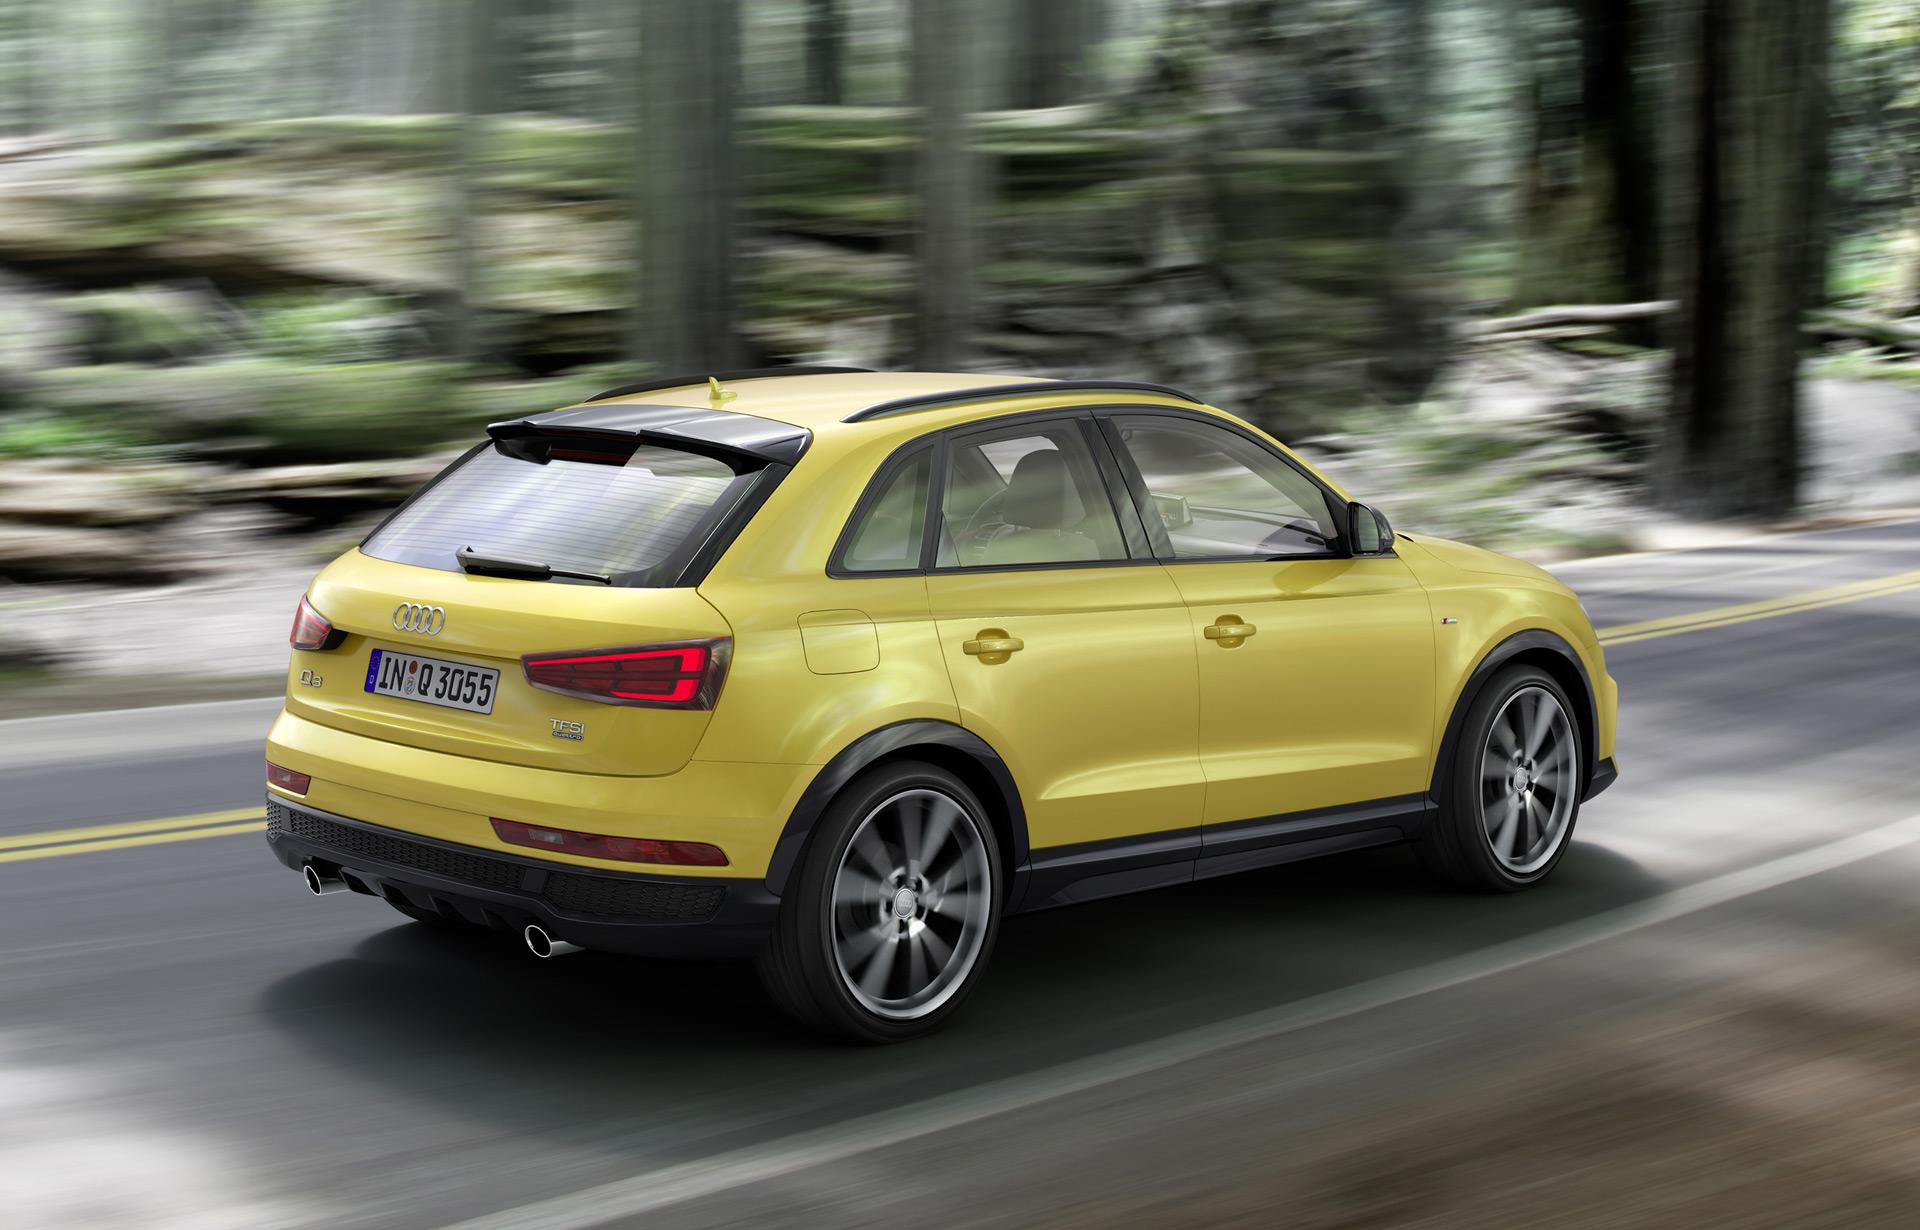 Kekurangan Audi Q3 2018 Spesifikasi